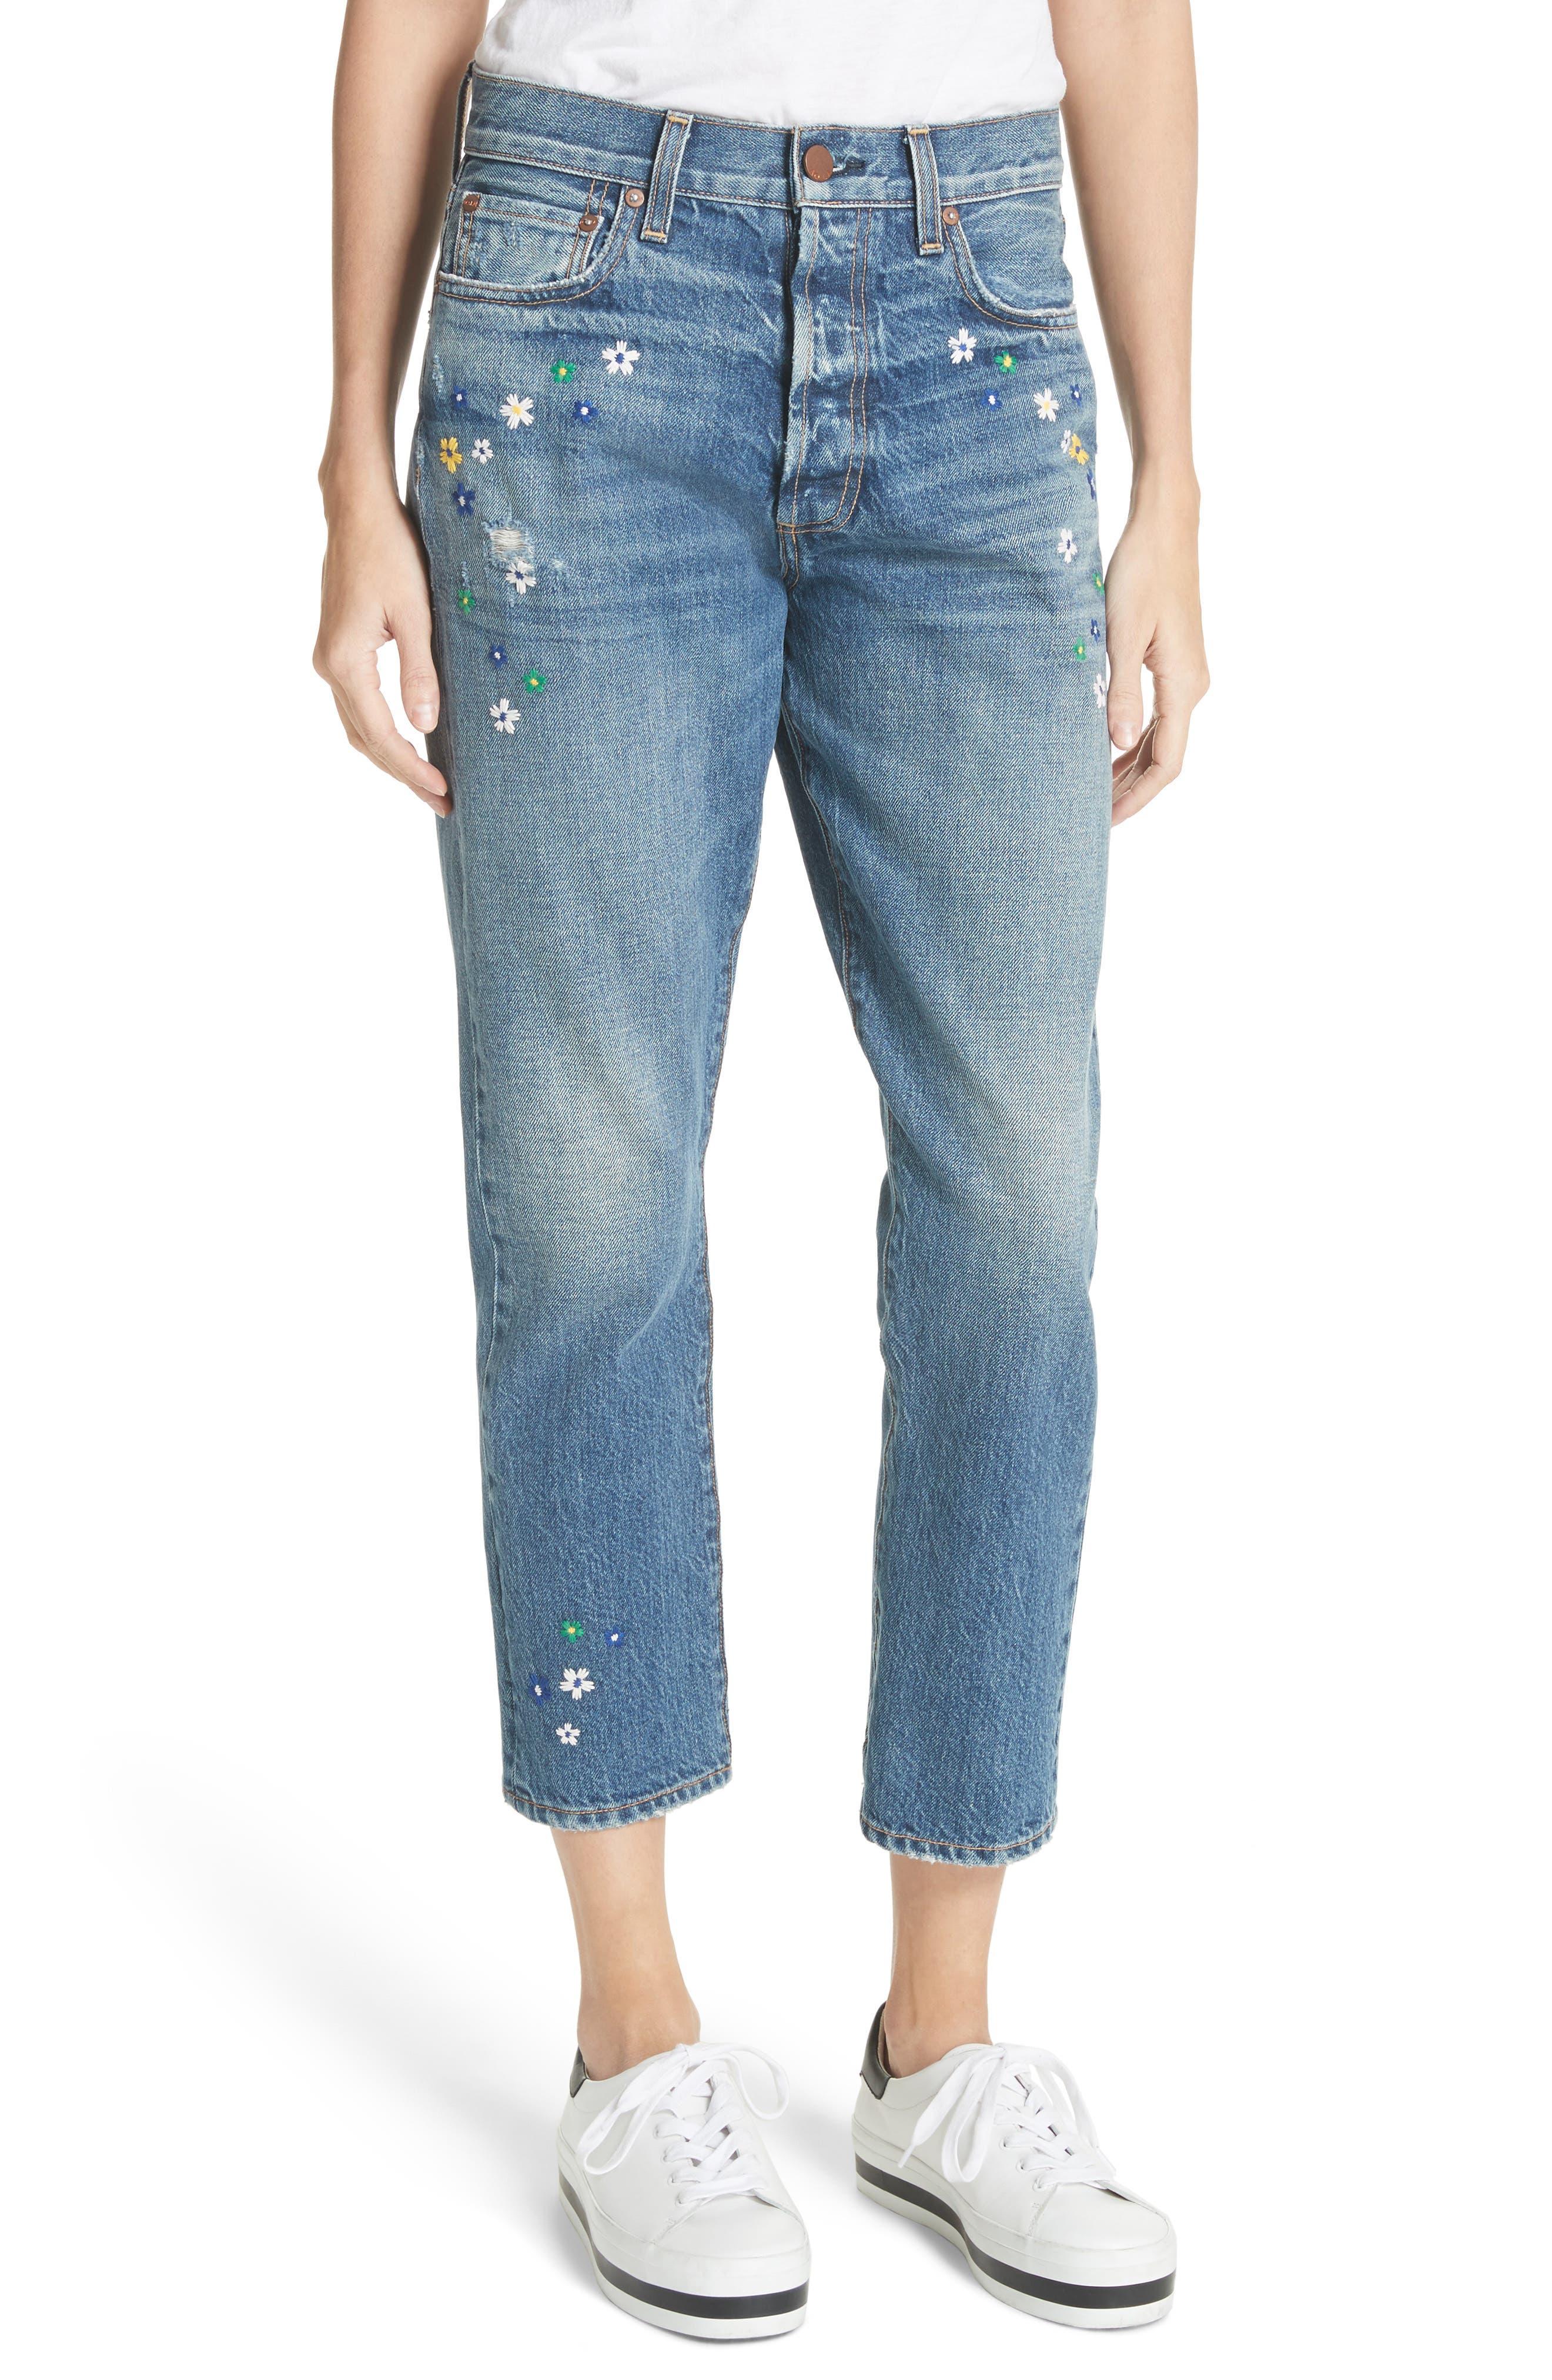 AO.LA Amazing Embroidered Slim Girlfriend Jeans,                         Main,                         color, 496